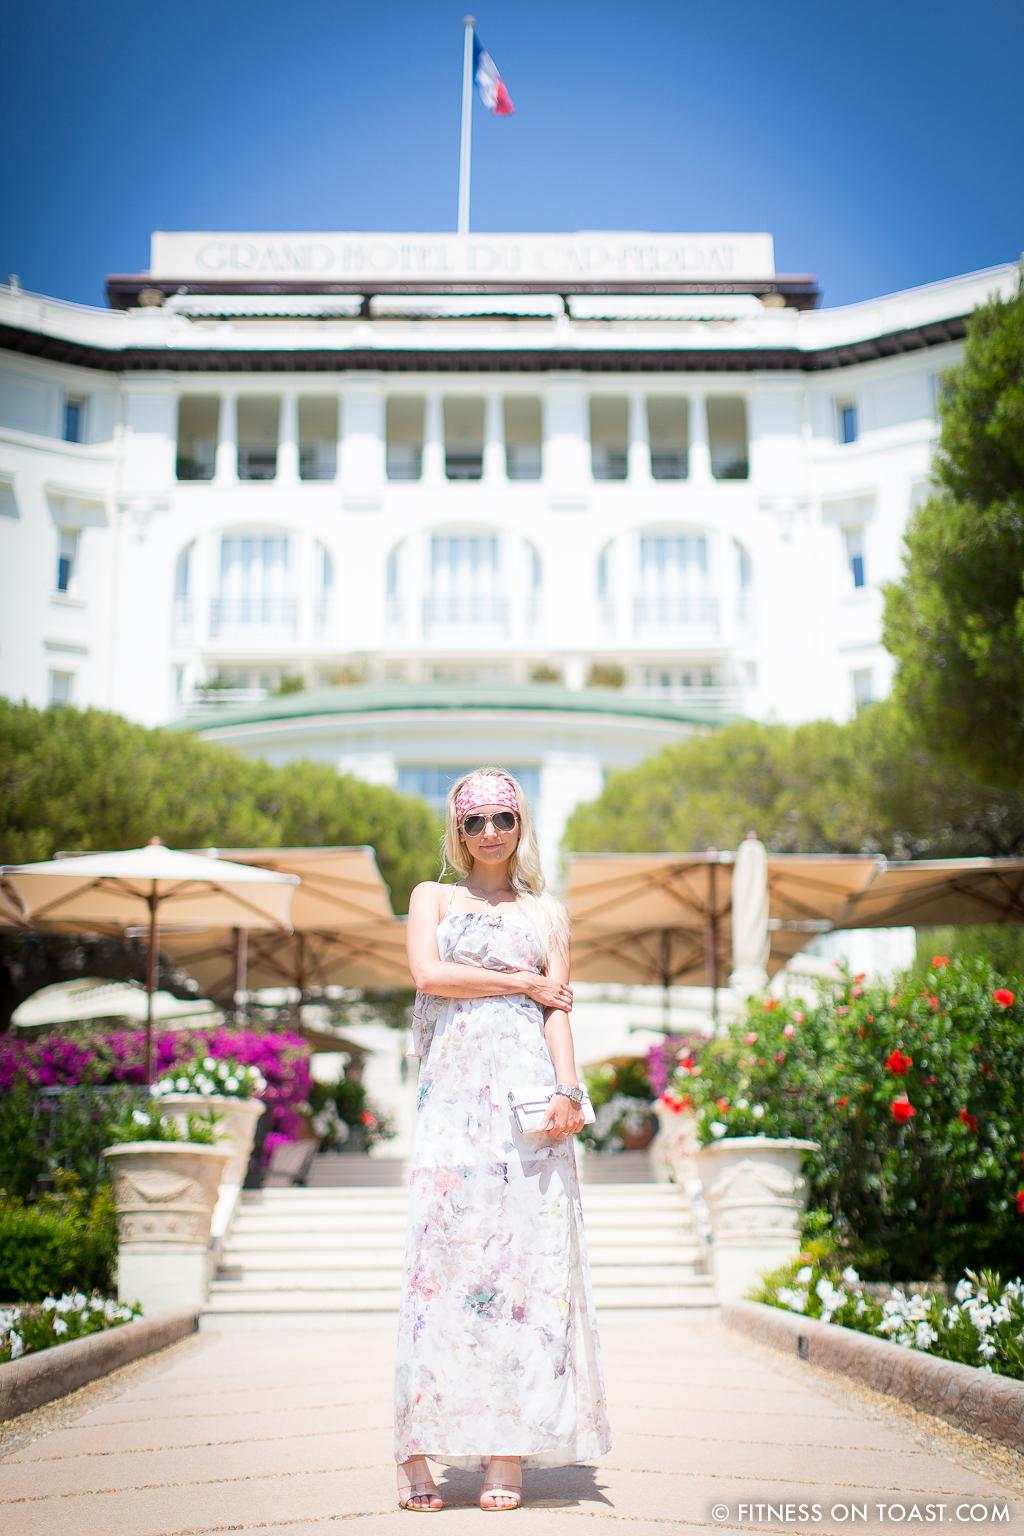 Fitness On Toast Faya Blog Benefits Of Walking Healthy Walk Grand Hotel Du Cap Ferrat Cote D'Azur Azur South Of France Exercise Calorie Burn Girl Fashion-2